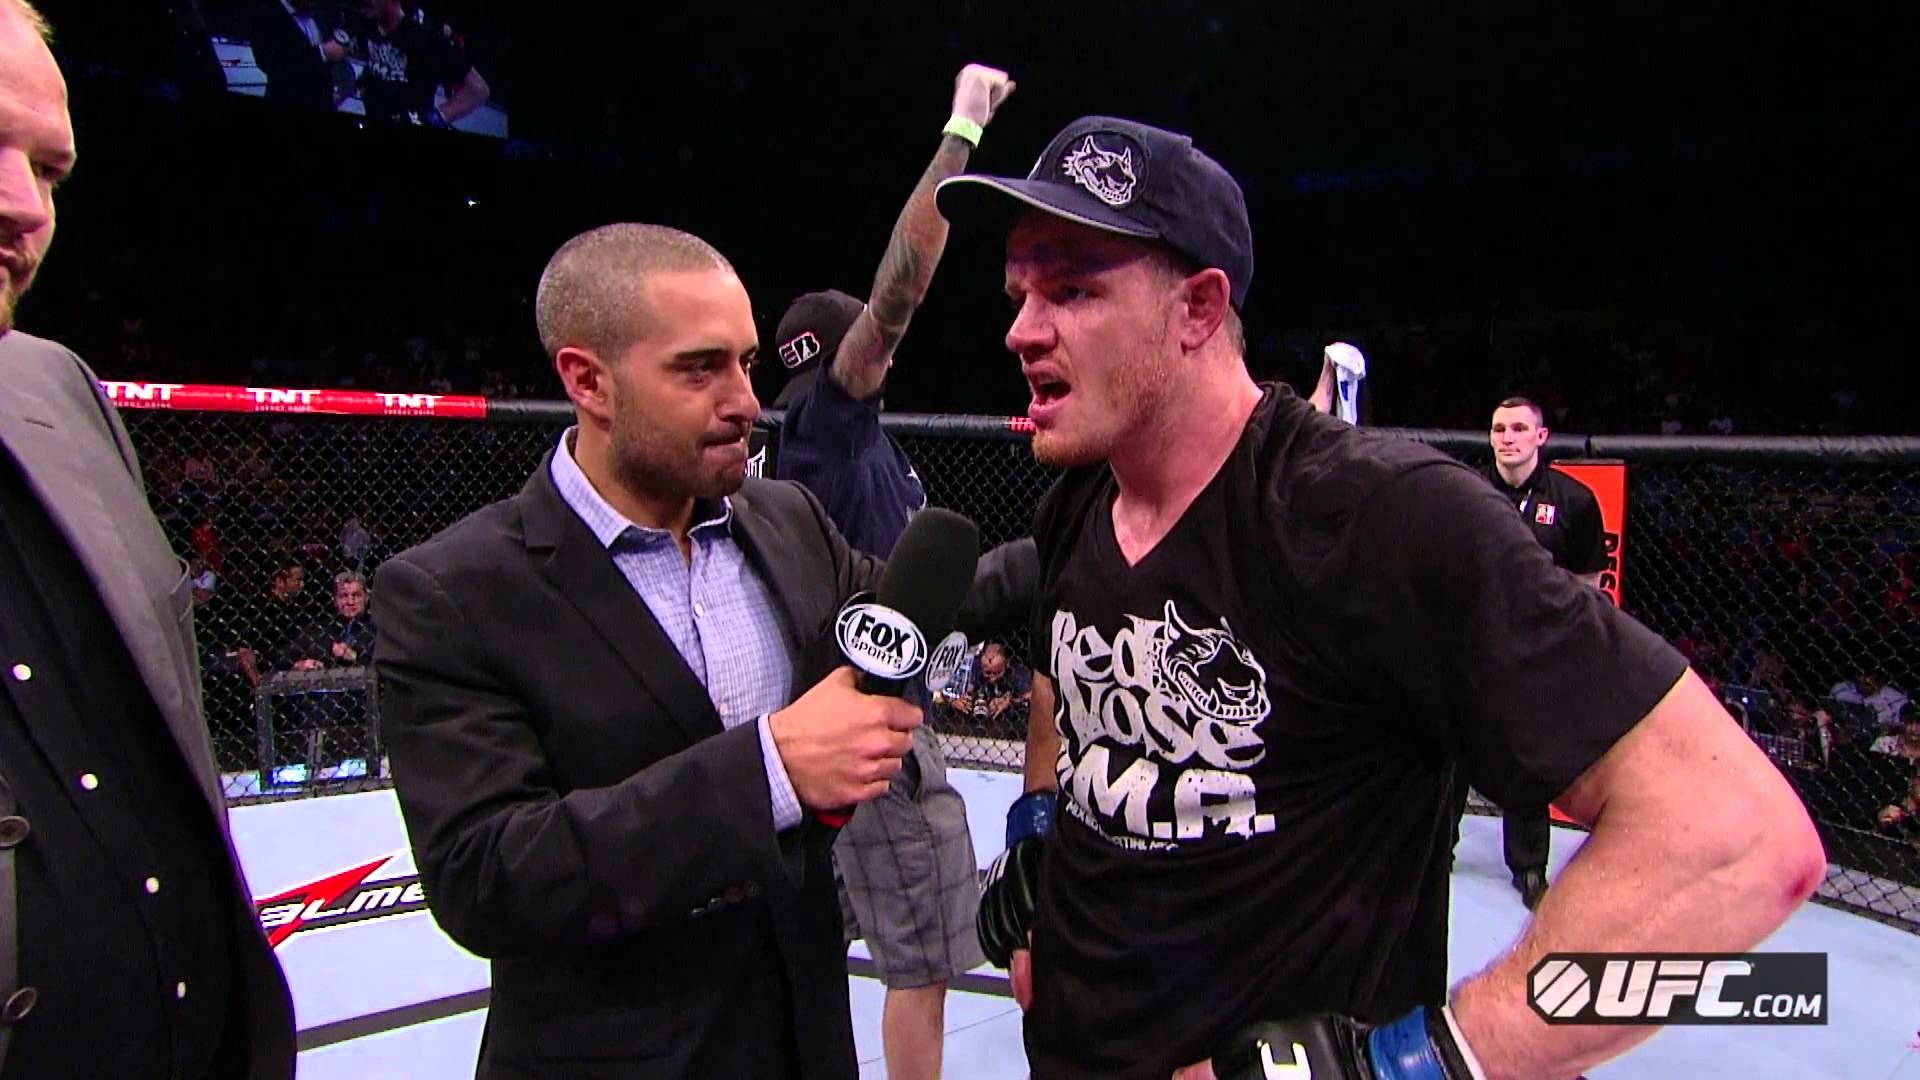 UFC 203 results: Jimmie Rivera shuts down Urijah Faber, wins unanimous decision